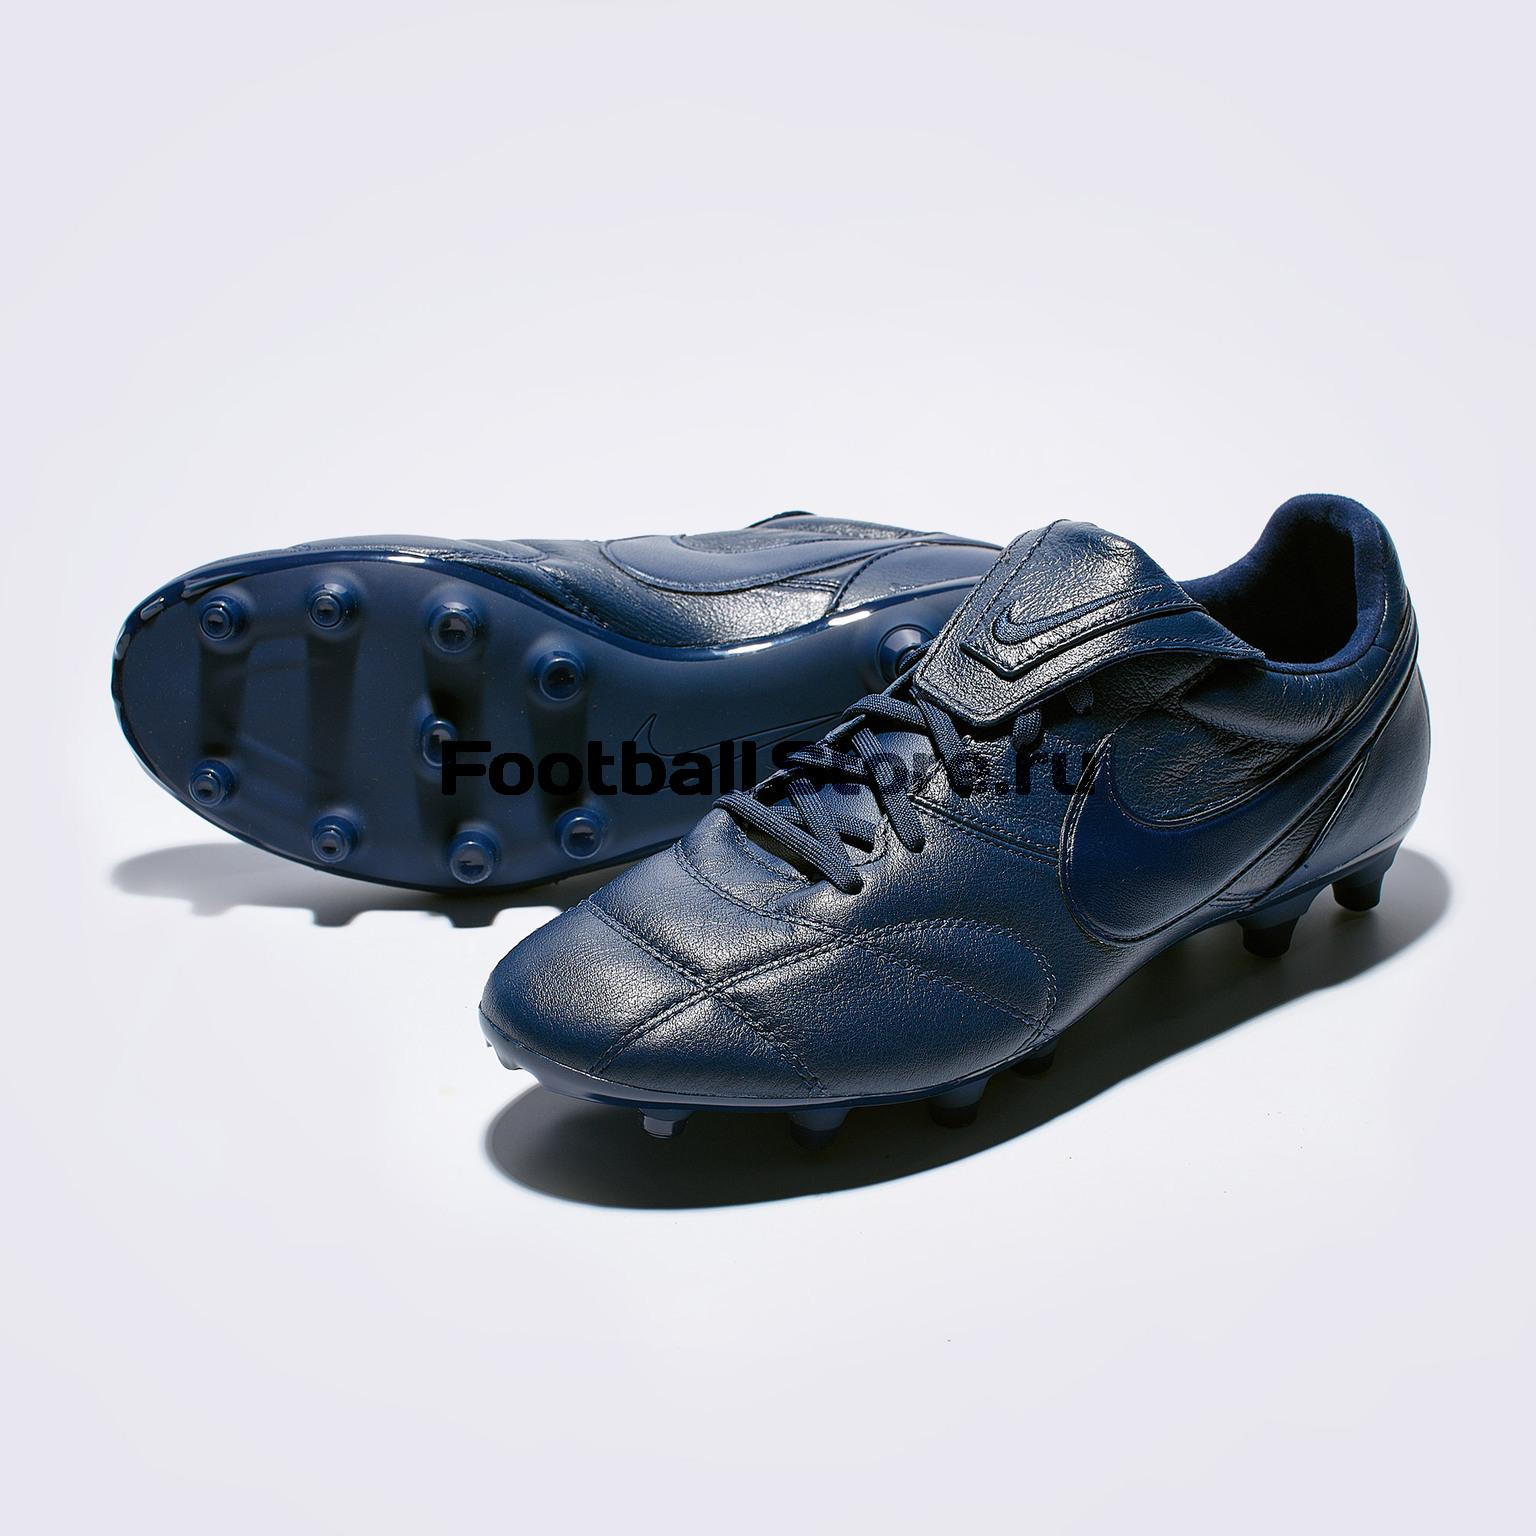 9814a835 ... Бутсы Nike Premier II FG 917803-441. О ТОВАРЕ; РАСЧЕТ ДОСТАВКИ